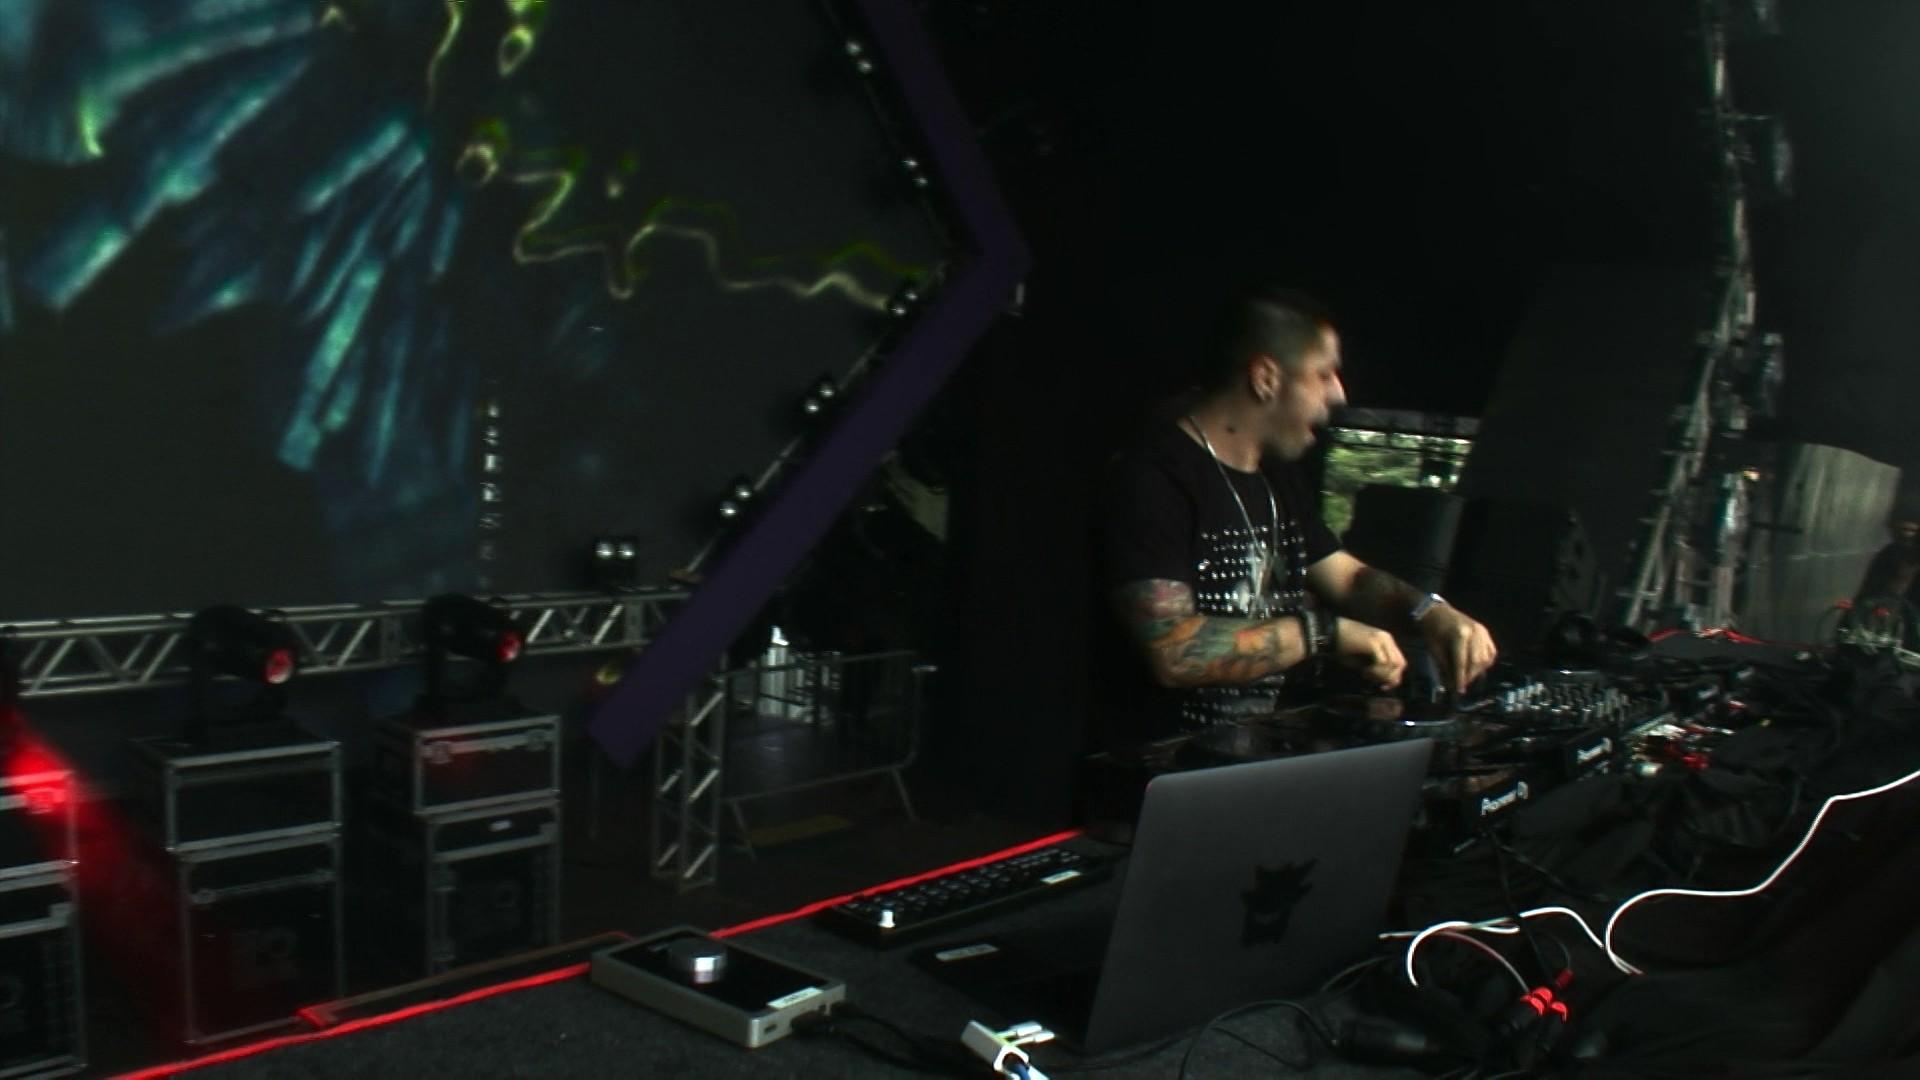 VÍDEOS: Veja trechos dos shows do Palco Perry - Lollapalooza 2018